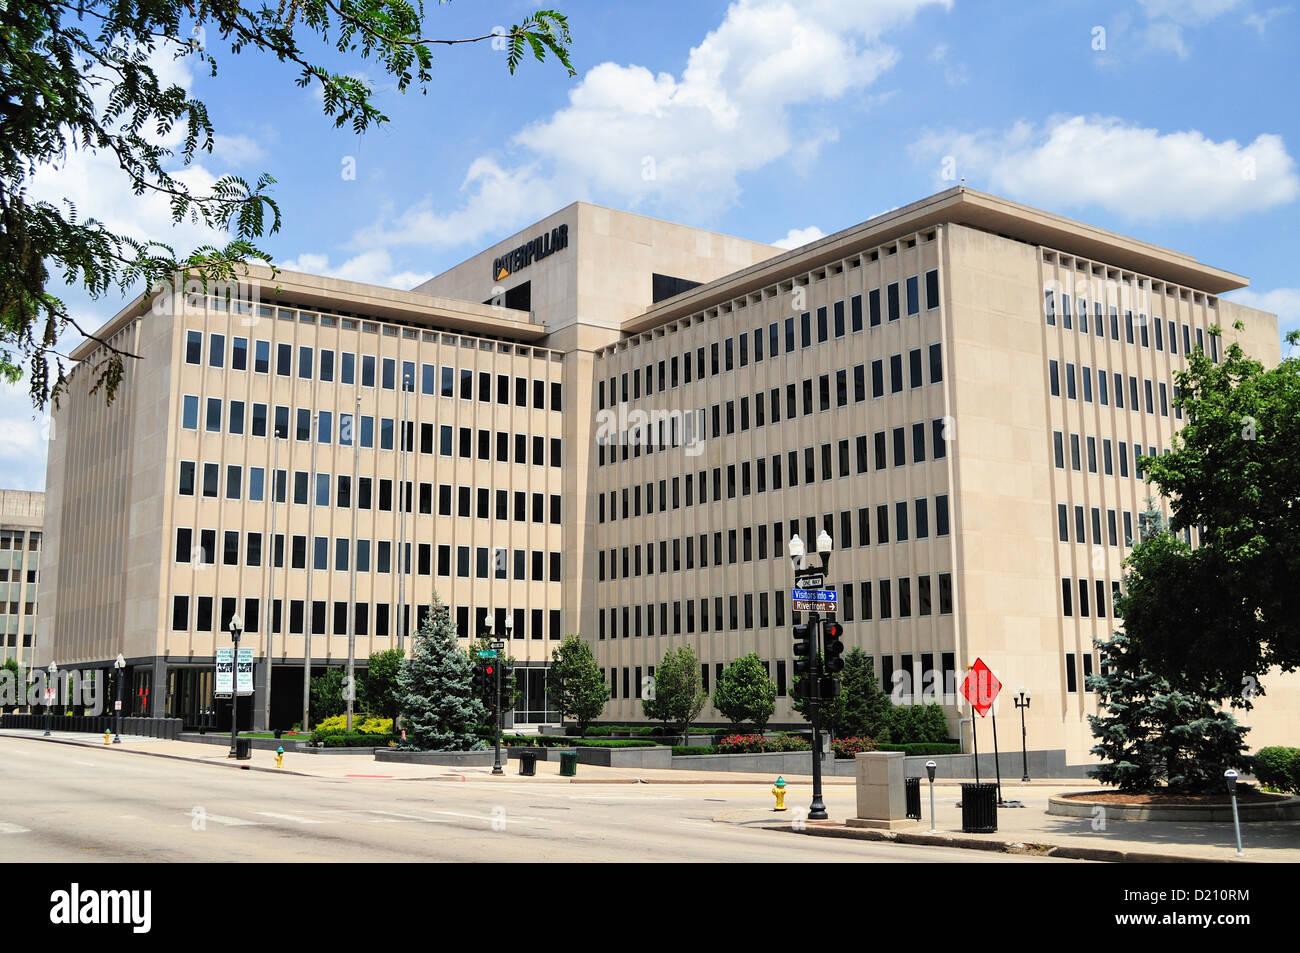 Peoria, Illinois, USA. Corporate headquarters of Peoria-based Caterpillar, Inc. - Stock Image